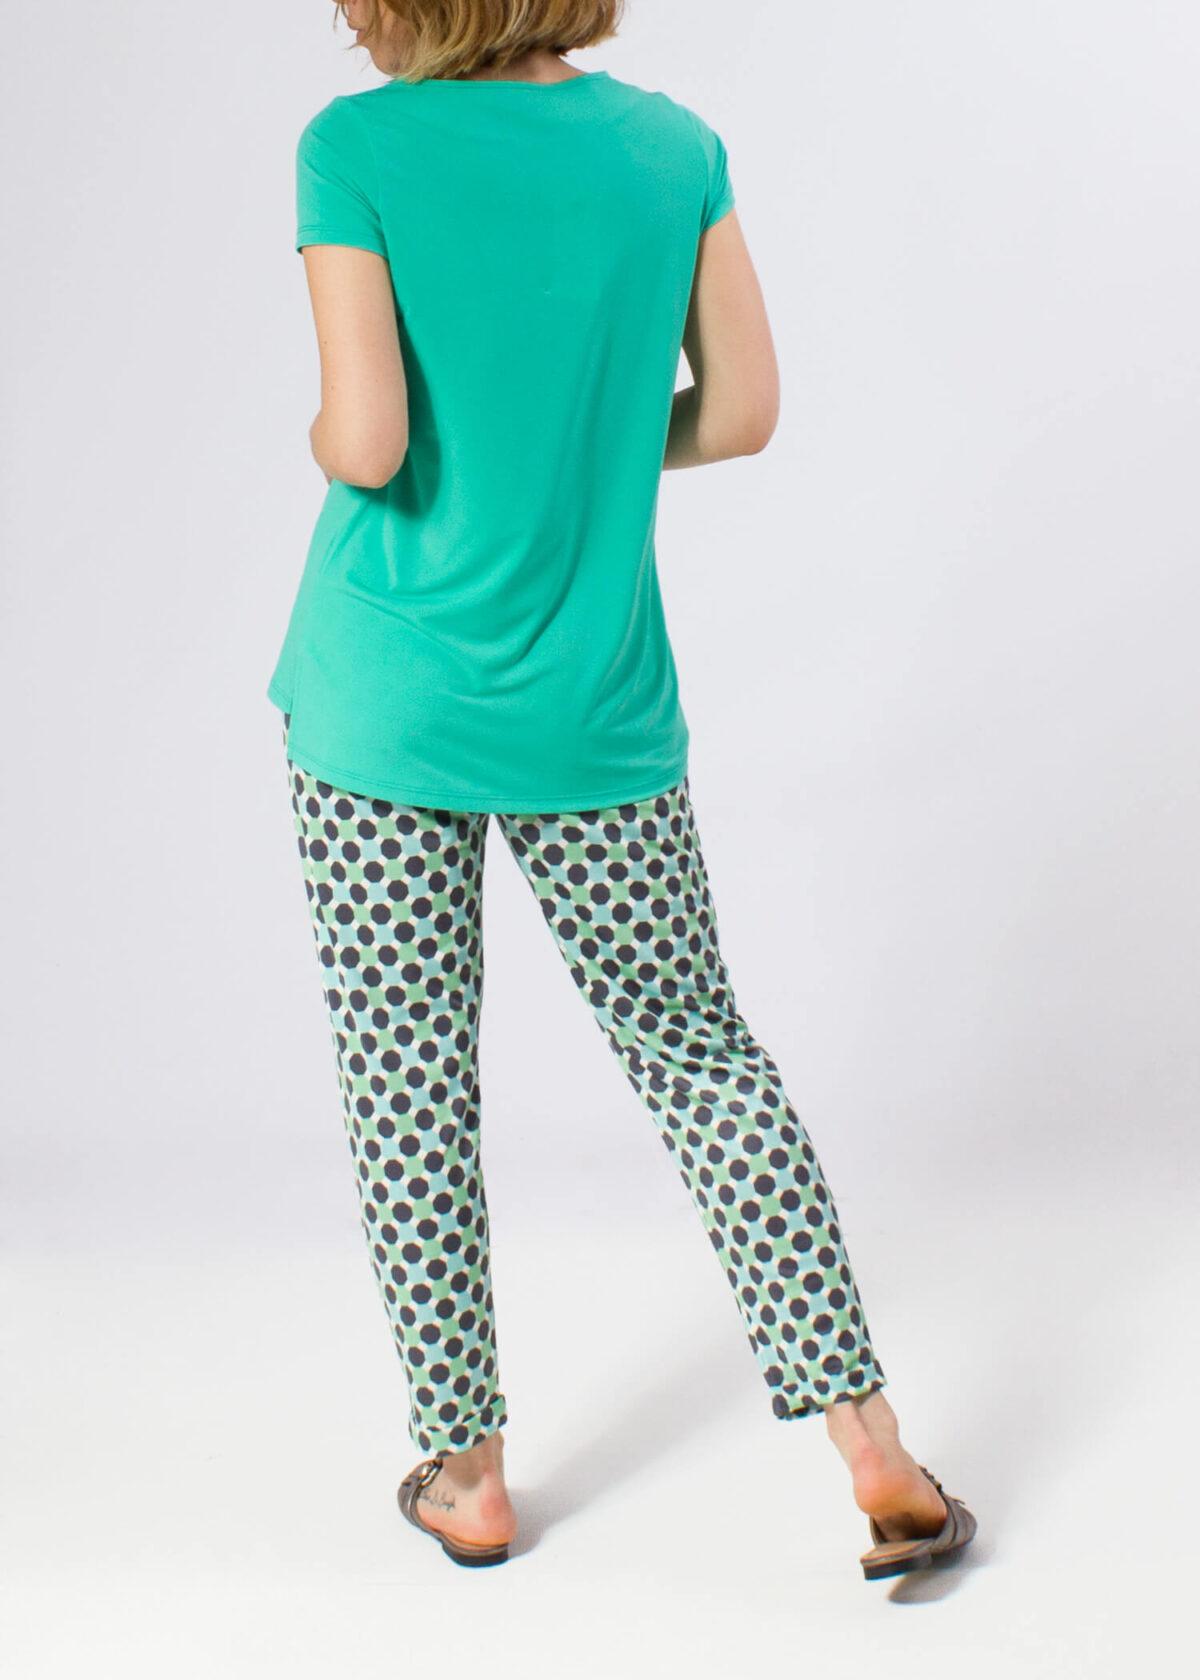 pantalon-mujer-punto-seda-estampado-turquesa-parole-italy-lopezientos